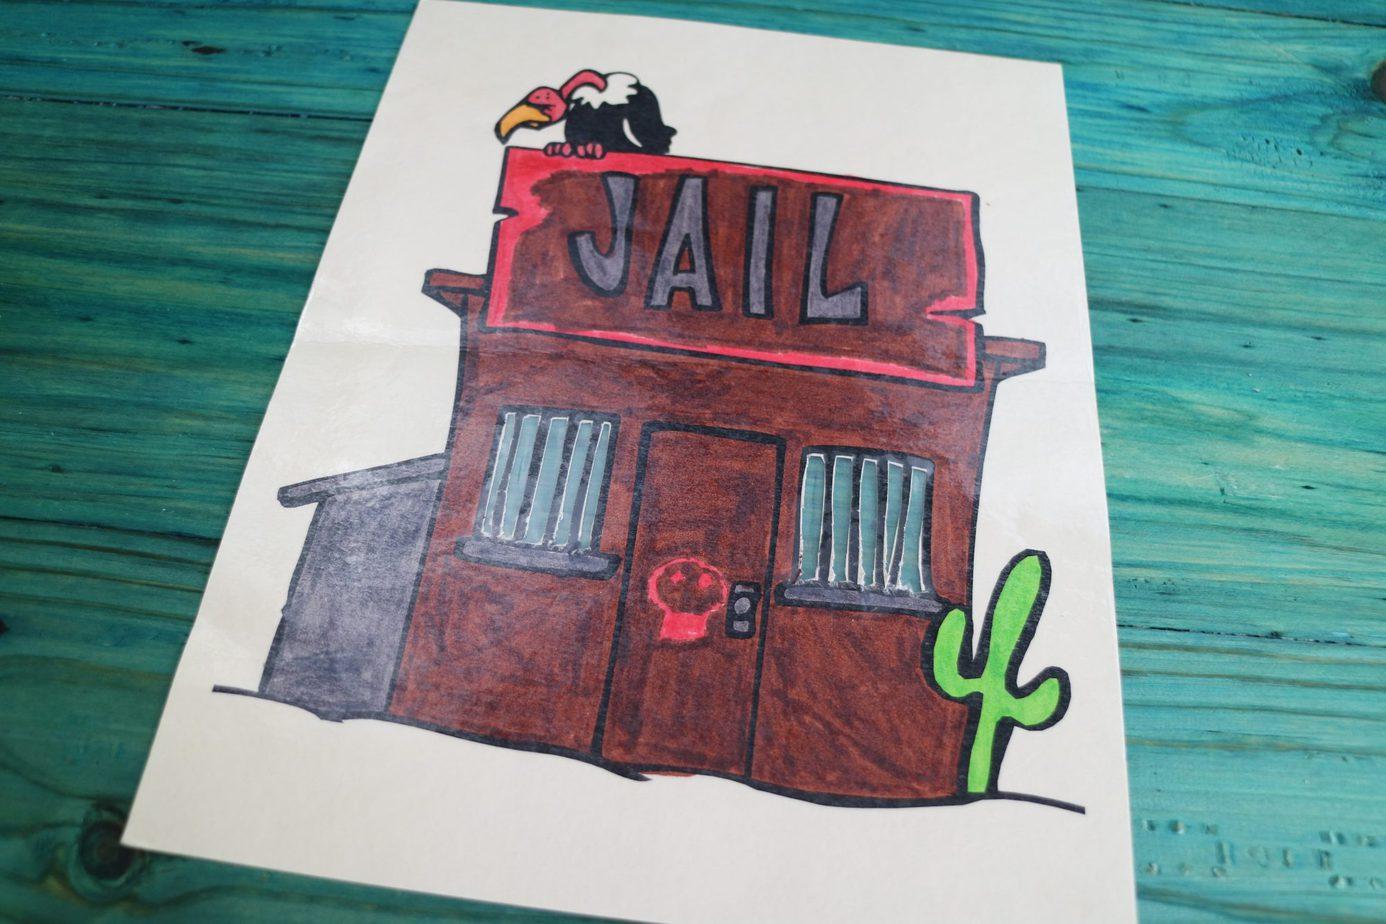 All About Spelling rule breakers word jail